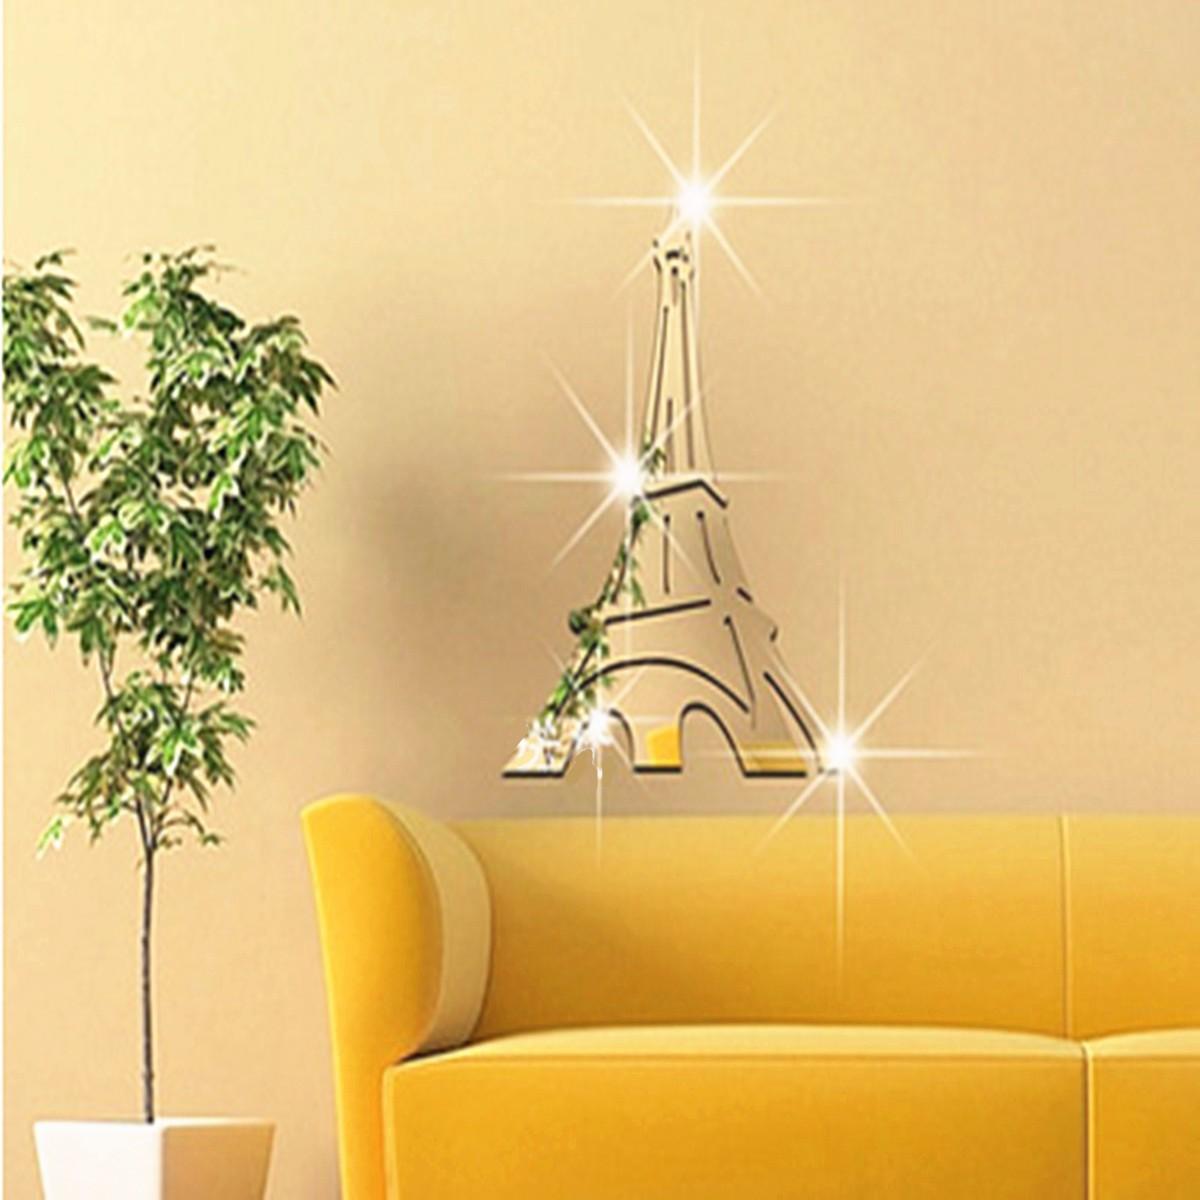 Diy Eiffel Tower Wall Art - Elitflat